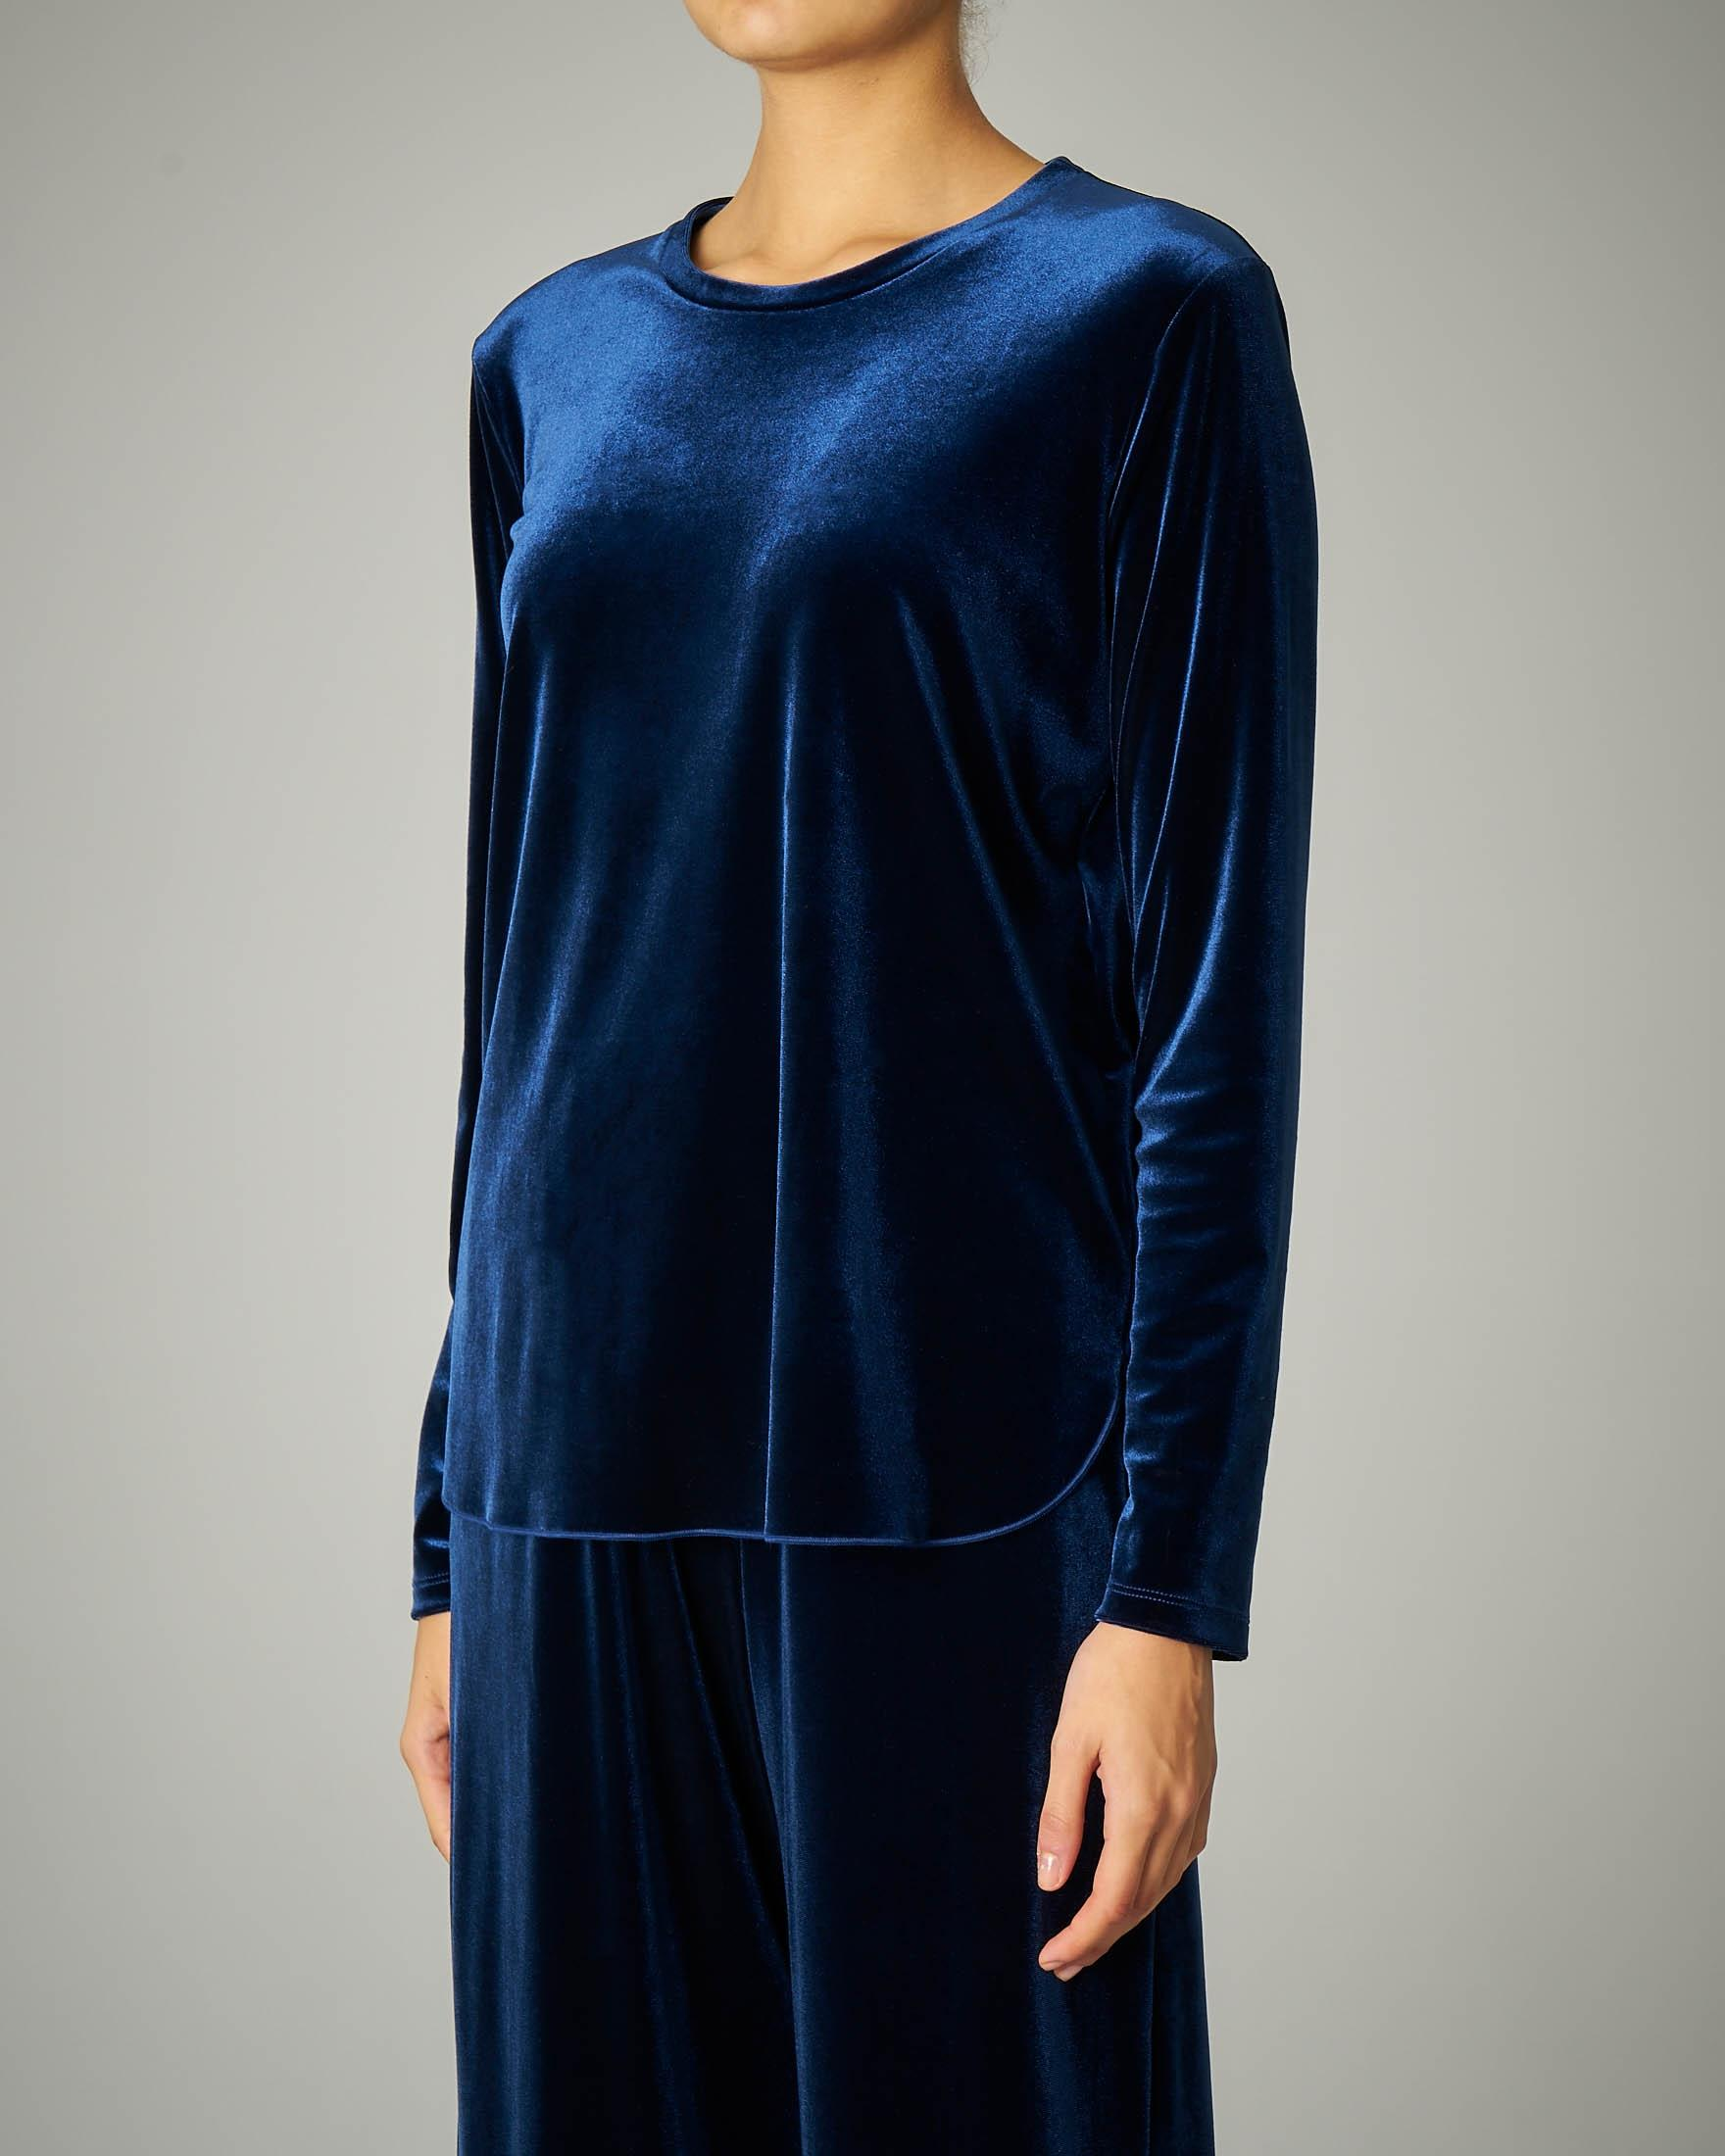 Blusa in velluto blu